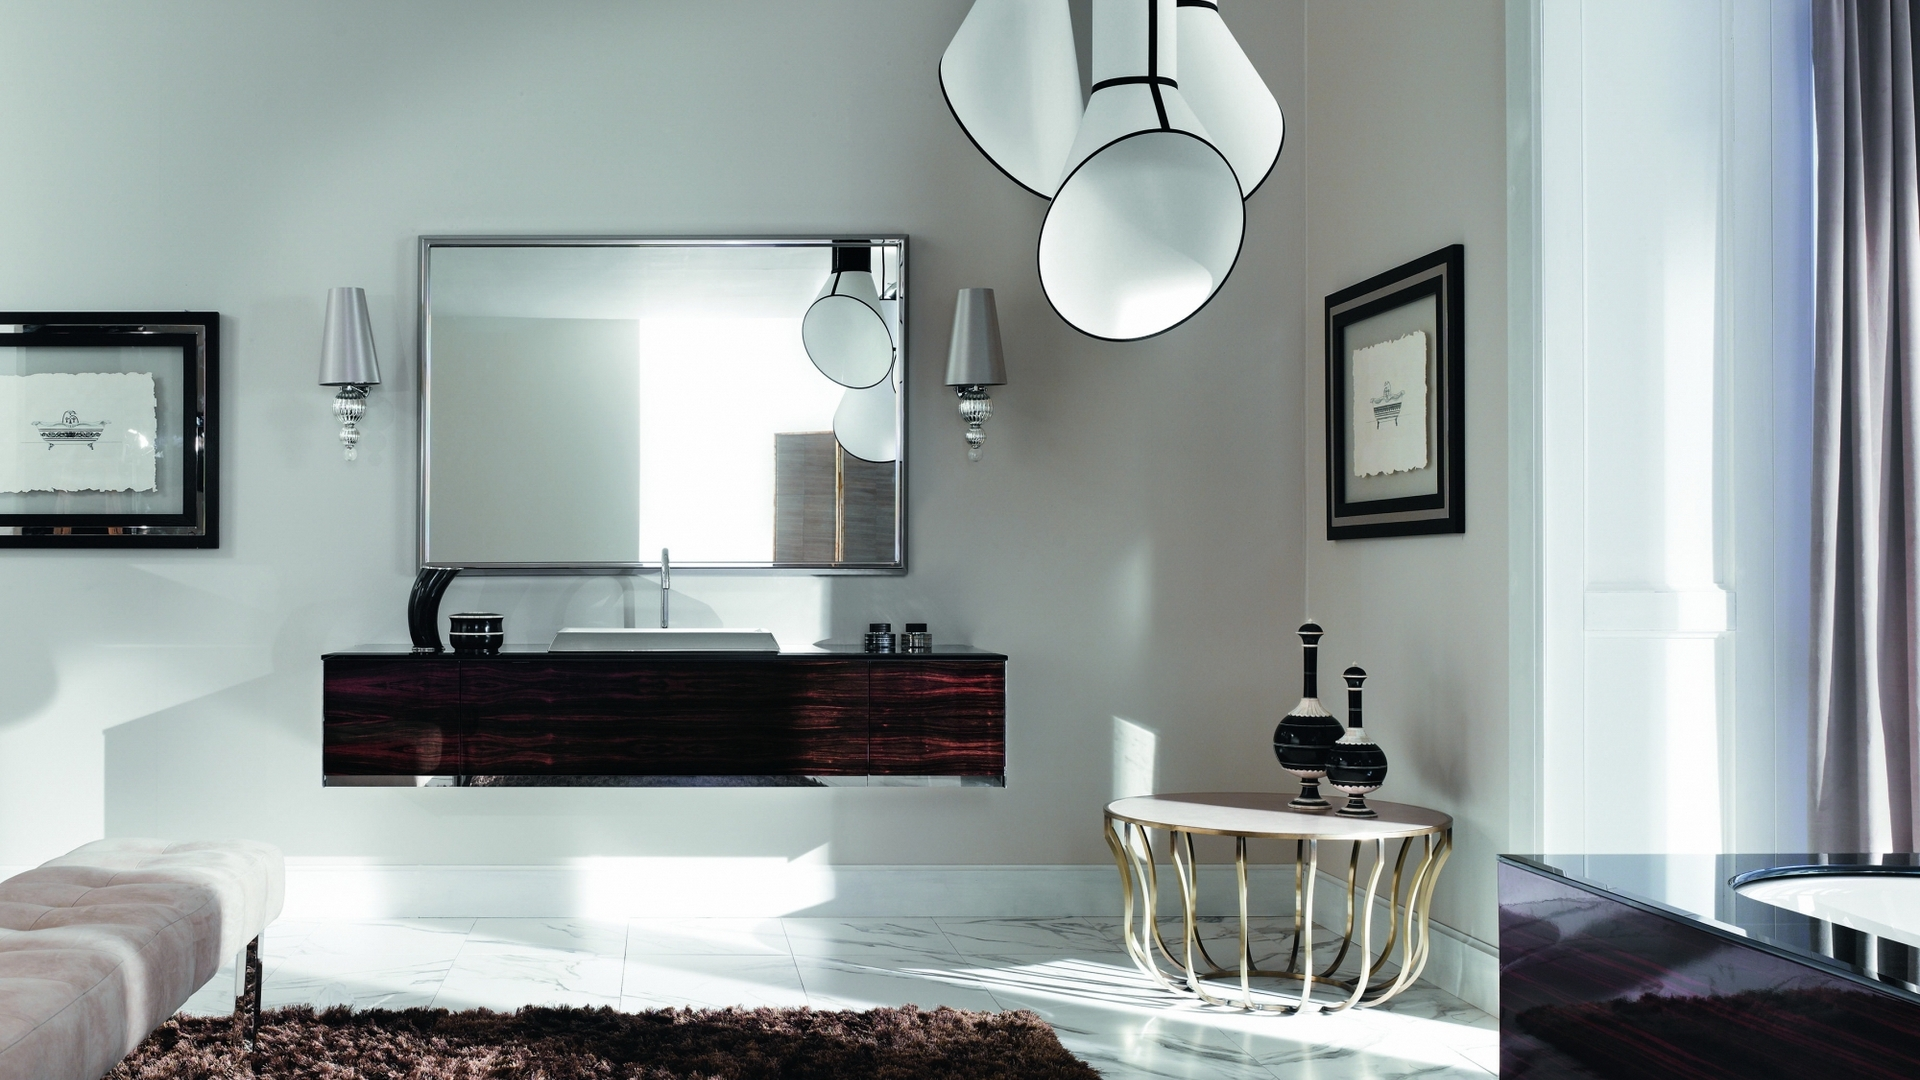 зеркало, столик, люстра